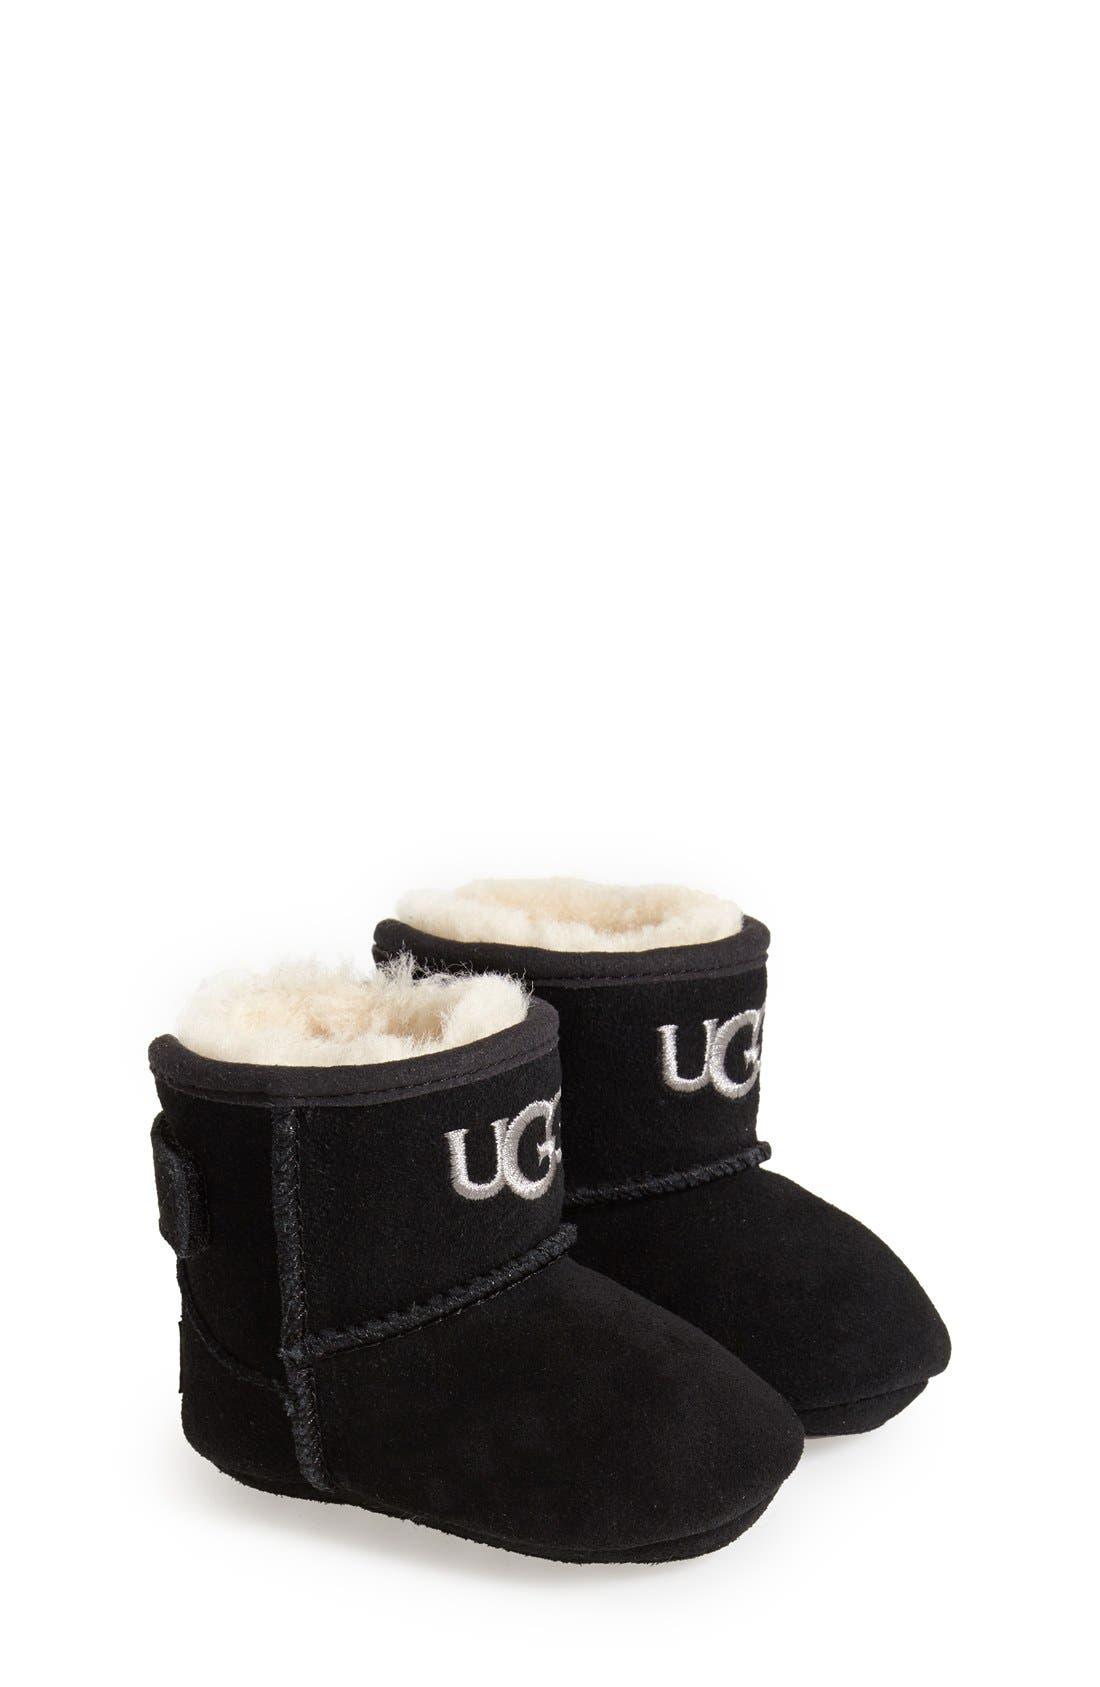 Alternate Image 1 Selected - UGG® 'Jesse' Suede Boot (Baby & Walker)